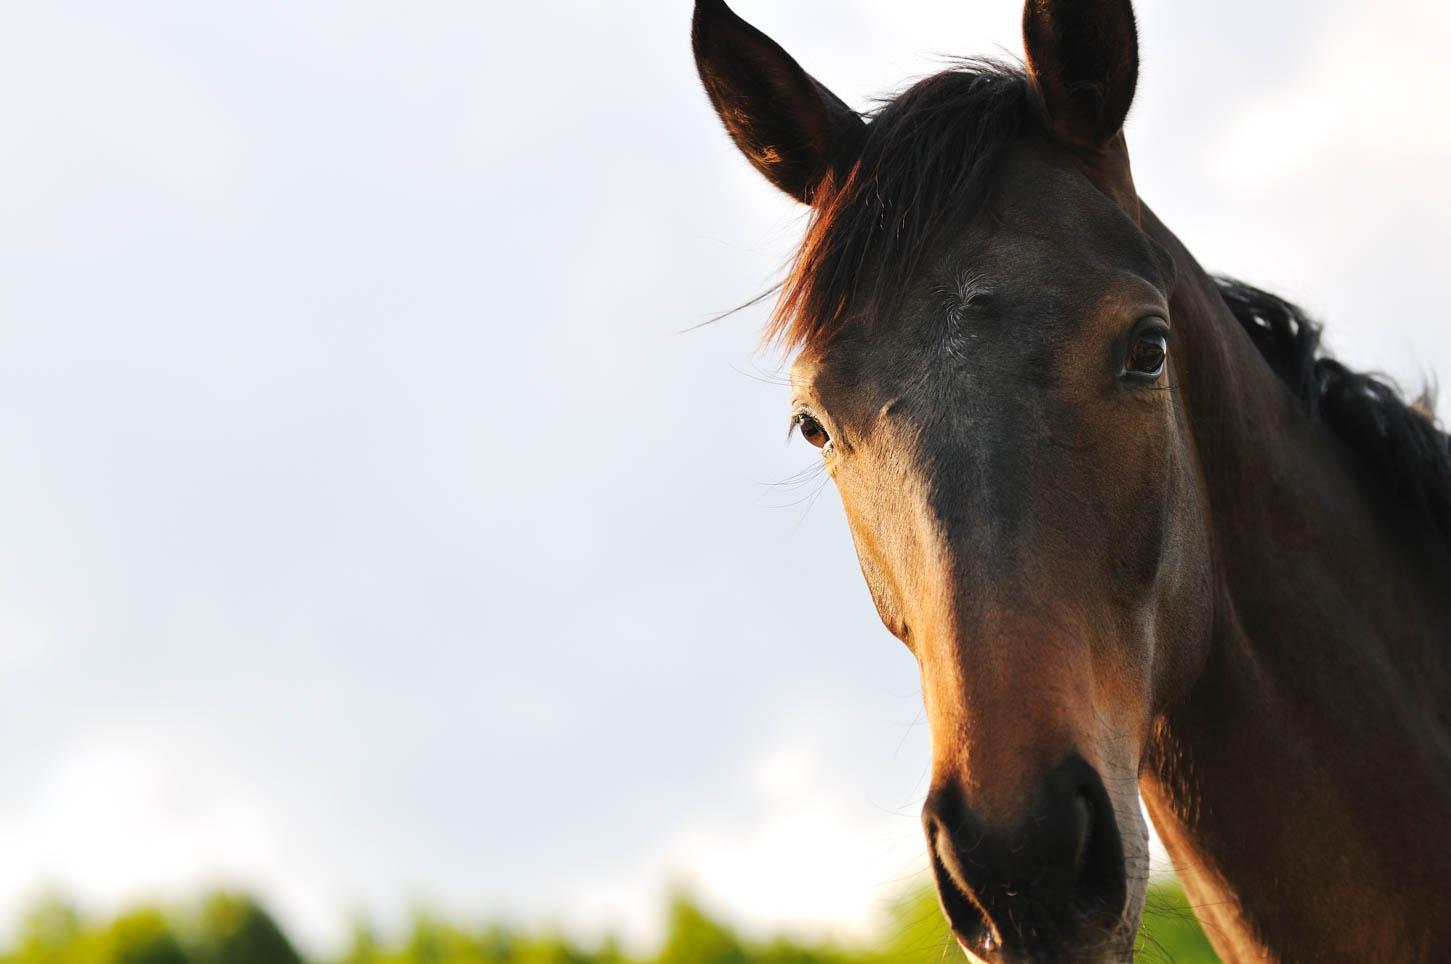 Racehorse Deaths: 12 Already This Year